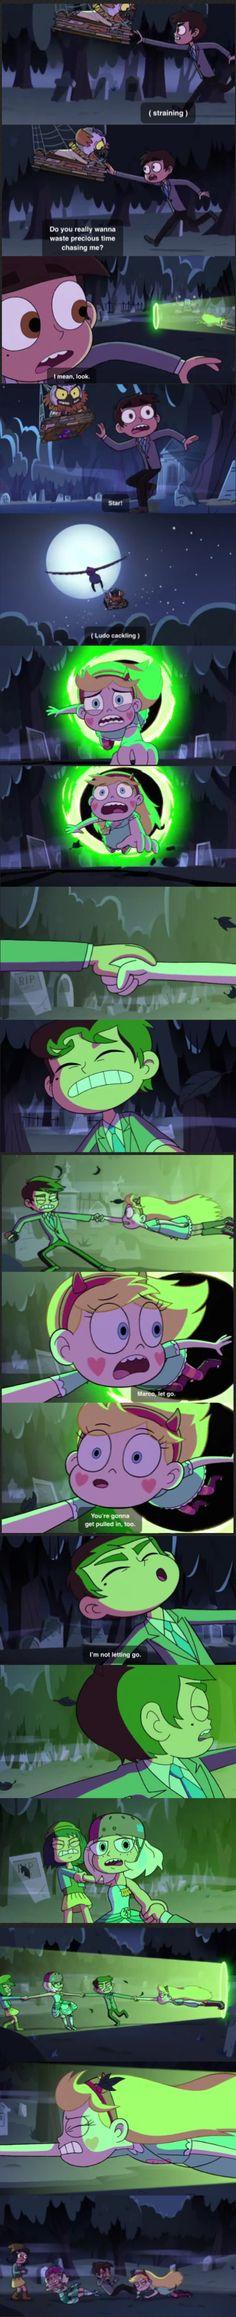 Saddest scene ever part 1 Star vs the forces of evil